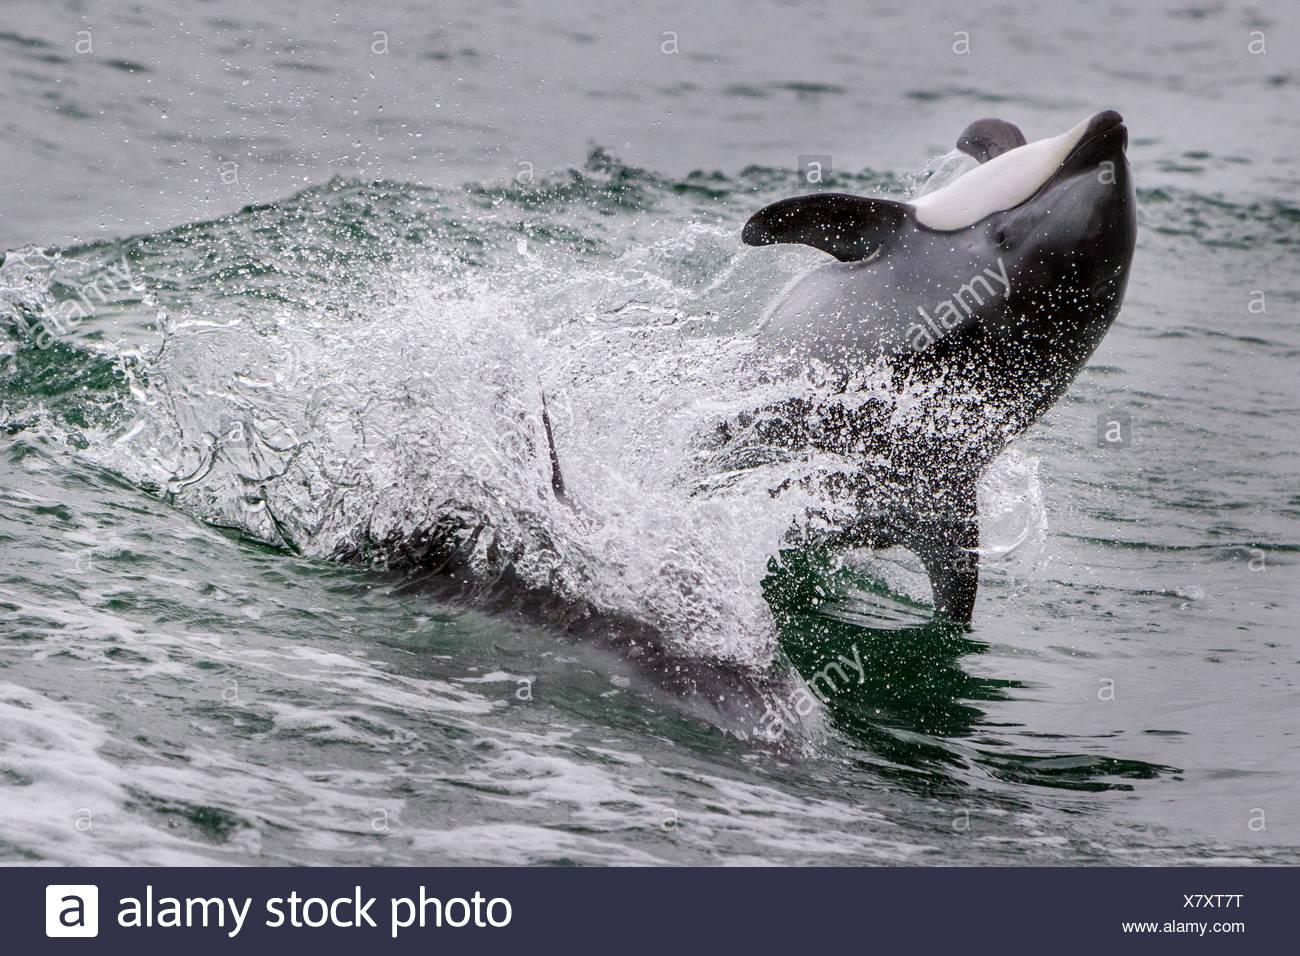 Pacific weiß beidseitig Dolphin jumping, zurück in broughton Archipel Marine Park, British Columbia, Kanada. Stockbild